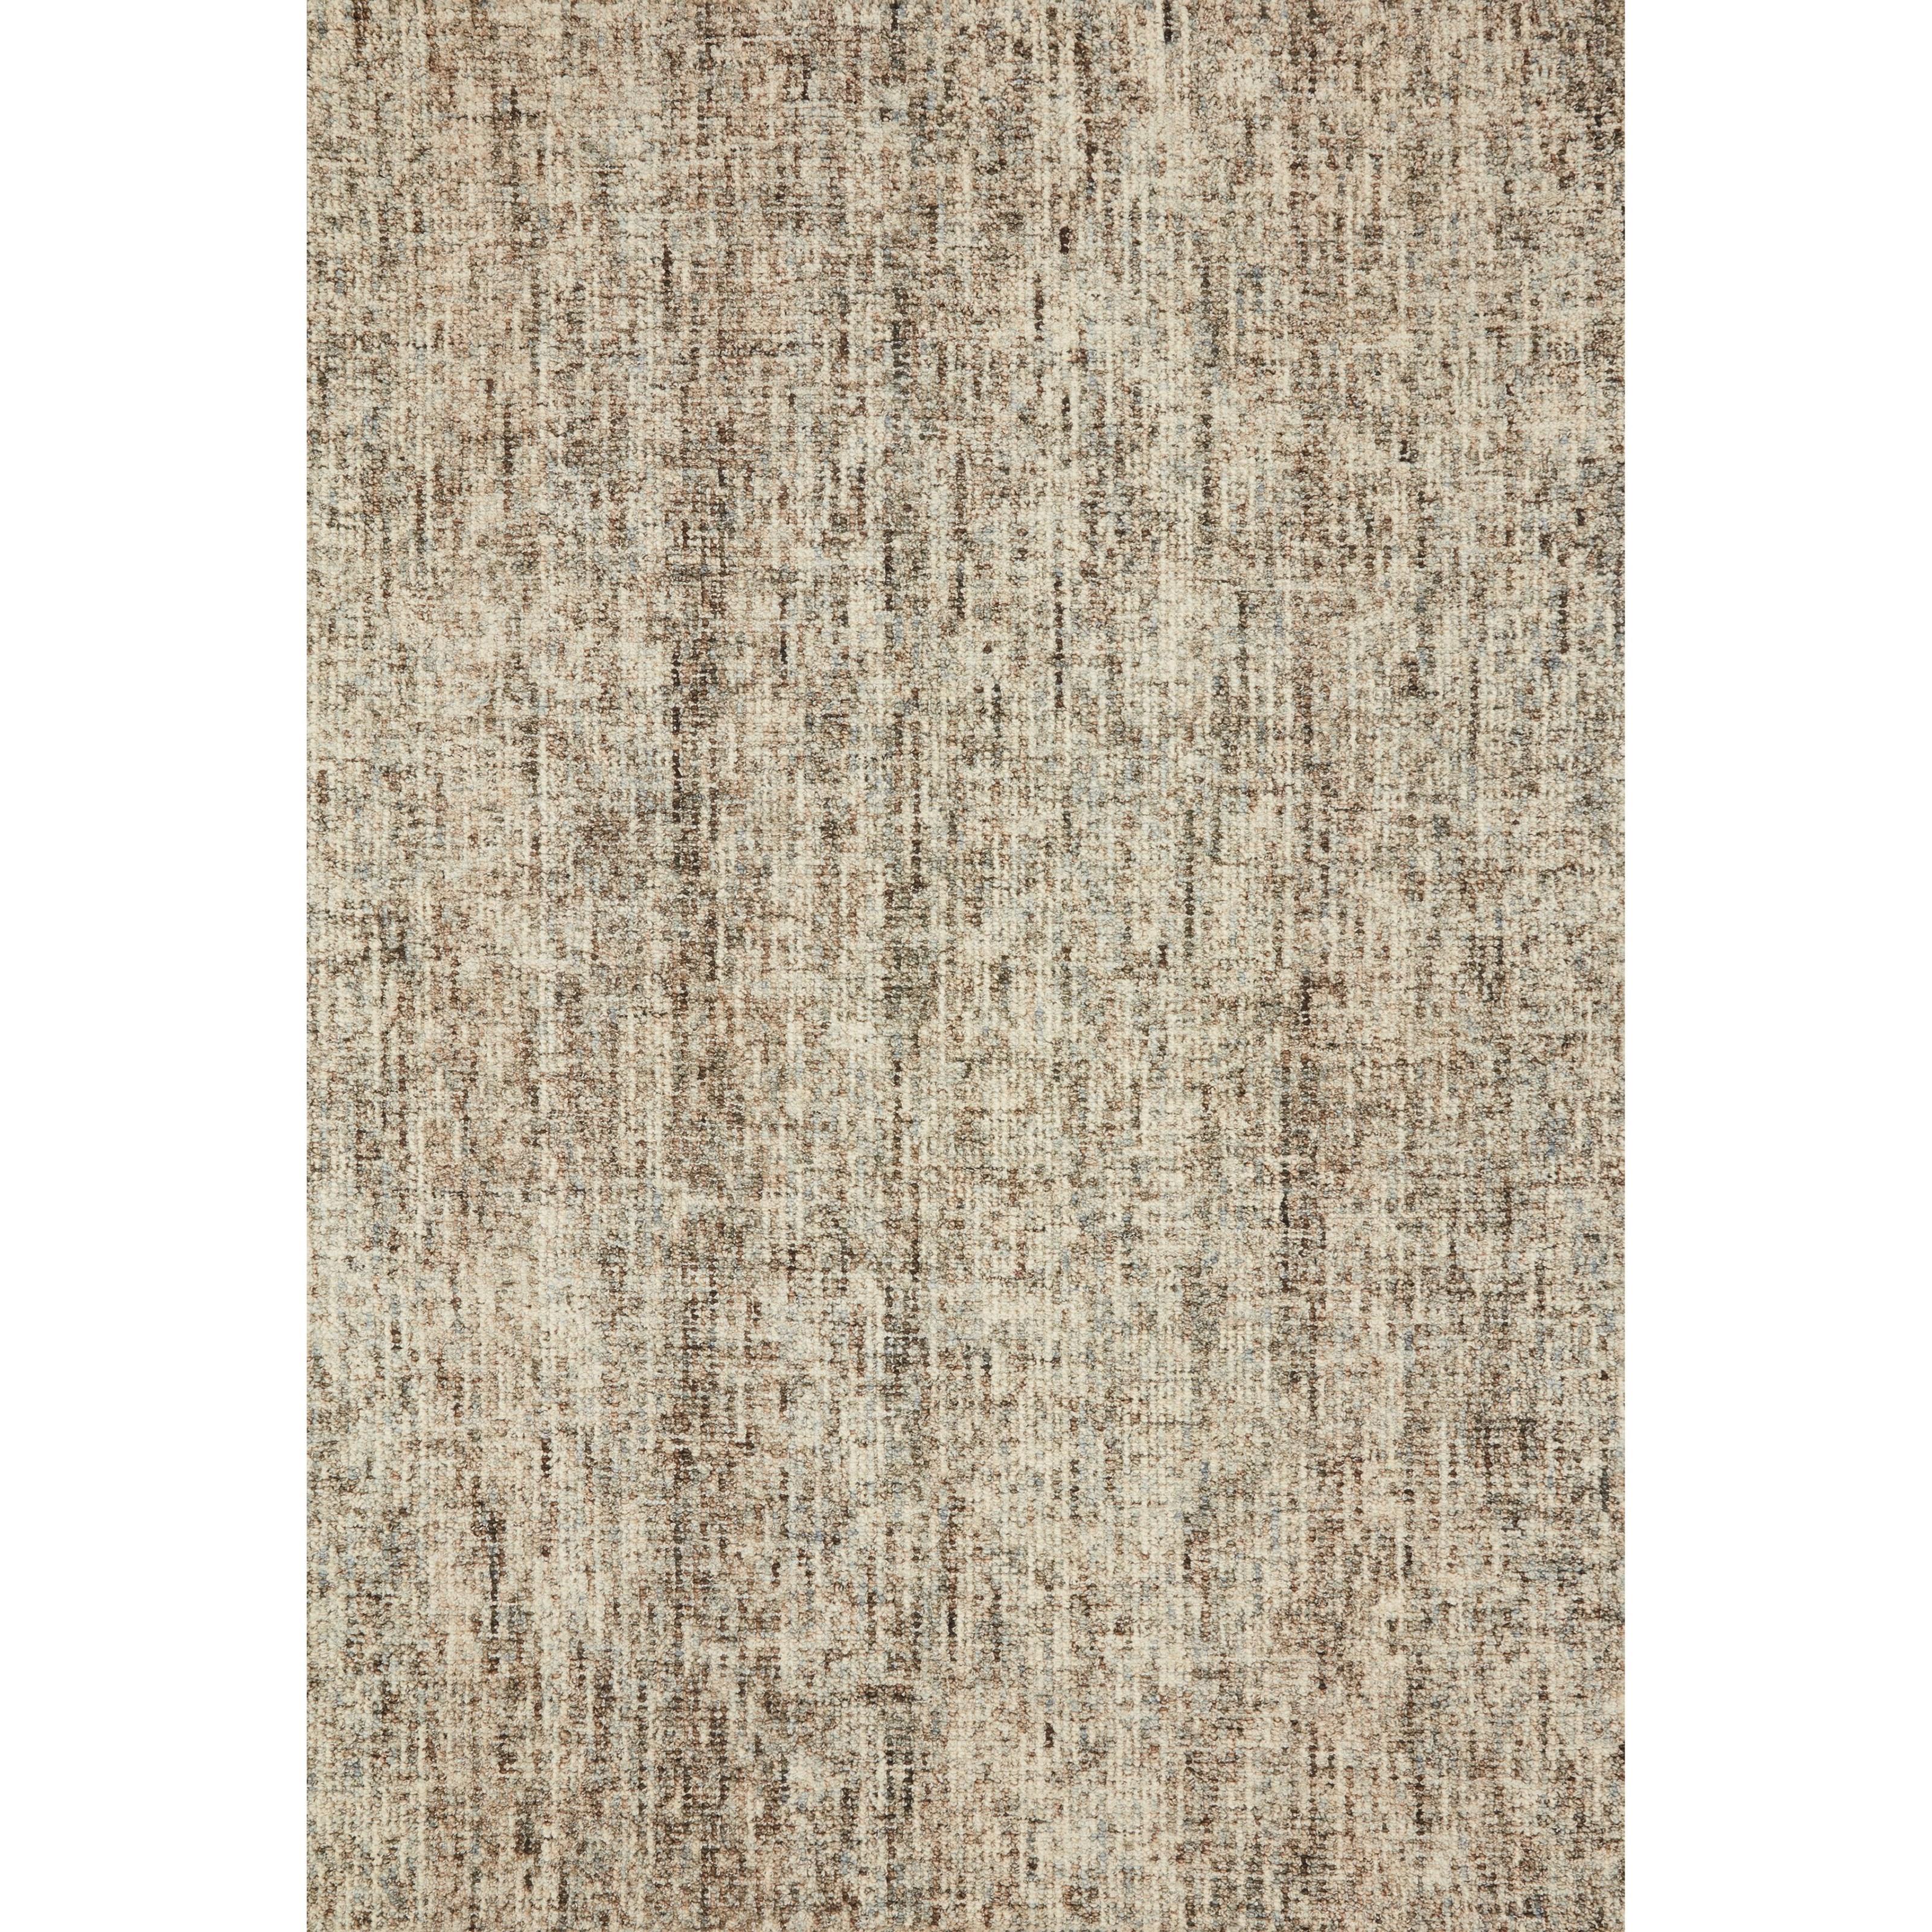 "Harlow 5'0"" x 7'6"" Mocha / Mist Rug by Loloi Rugs at Virginia Furniture Market"